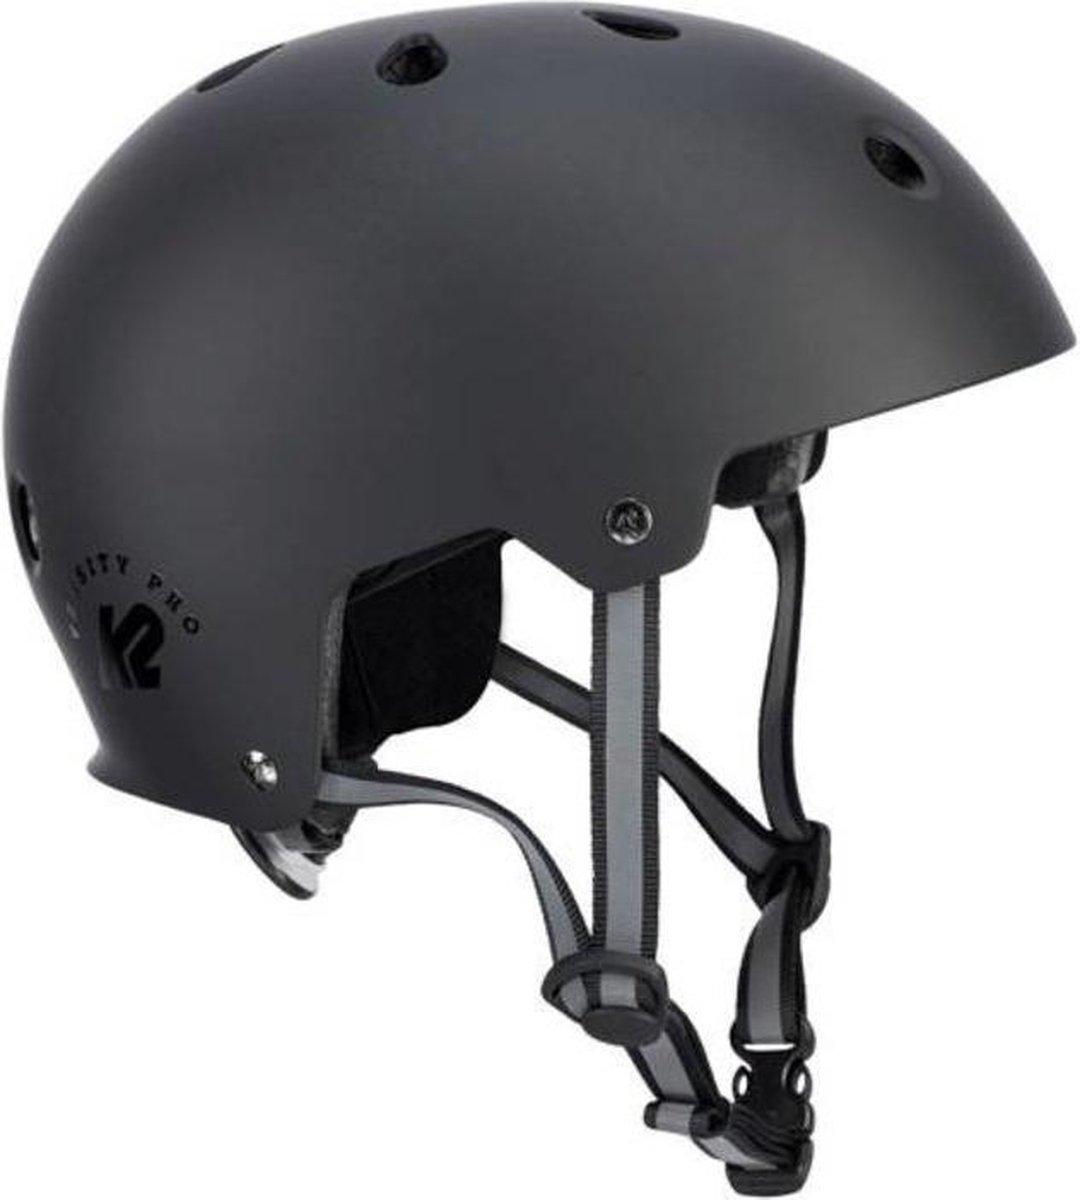 K2 helm varisity pro L